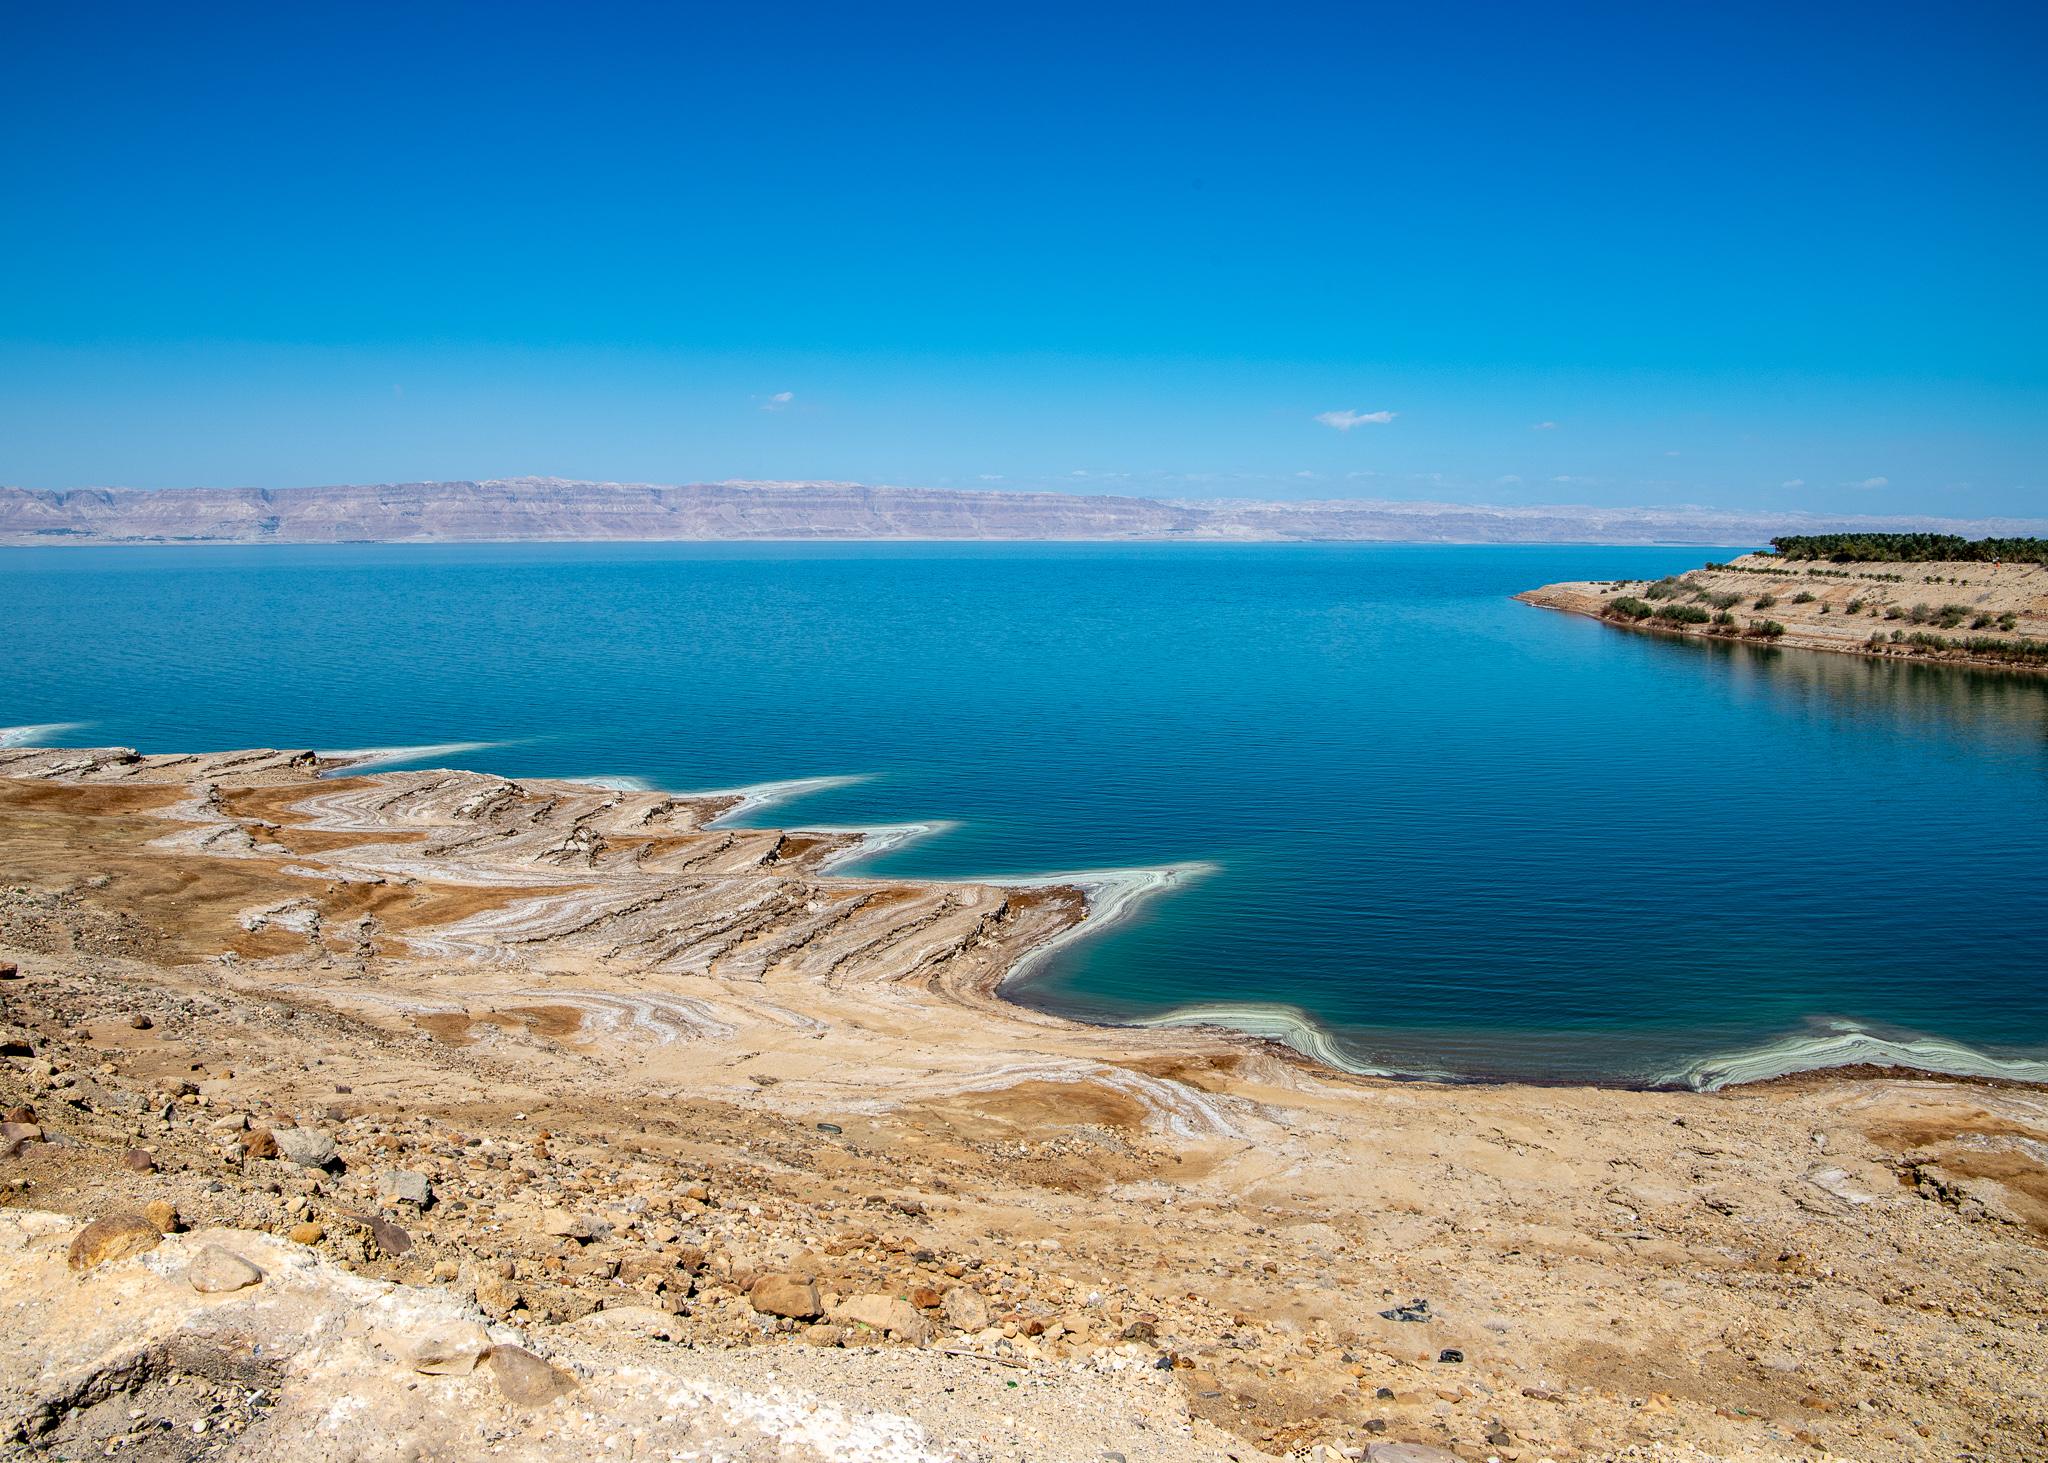 Salt deposits readily visible down at the shore